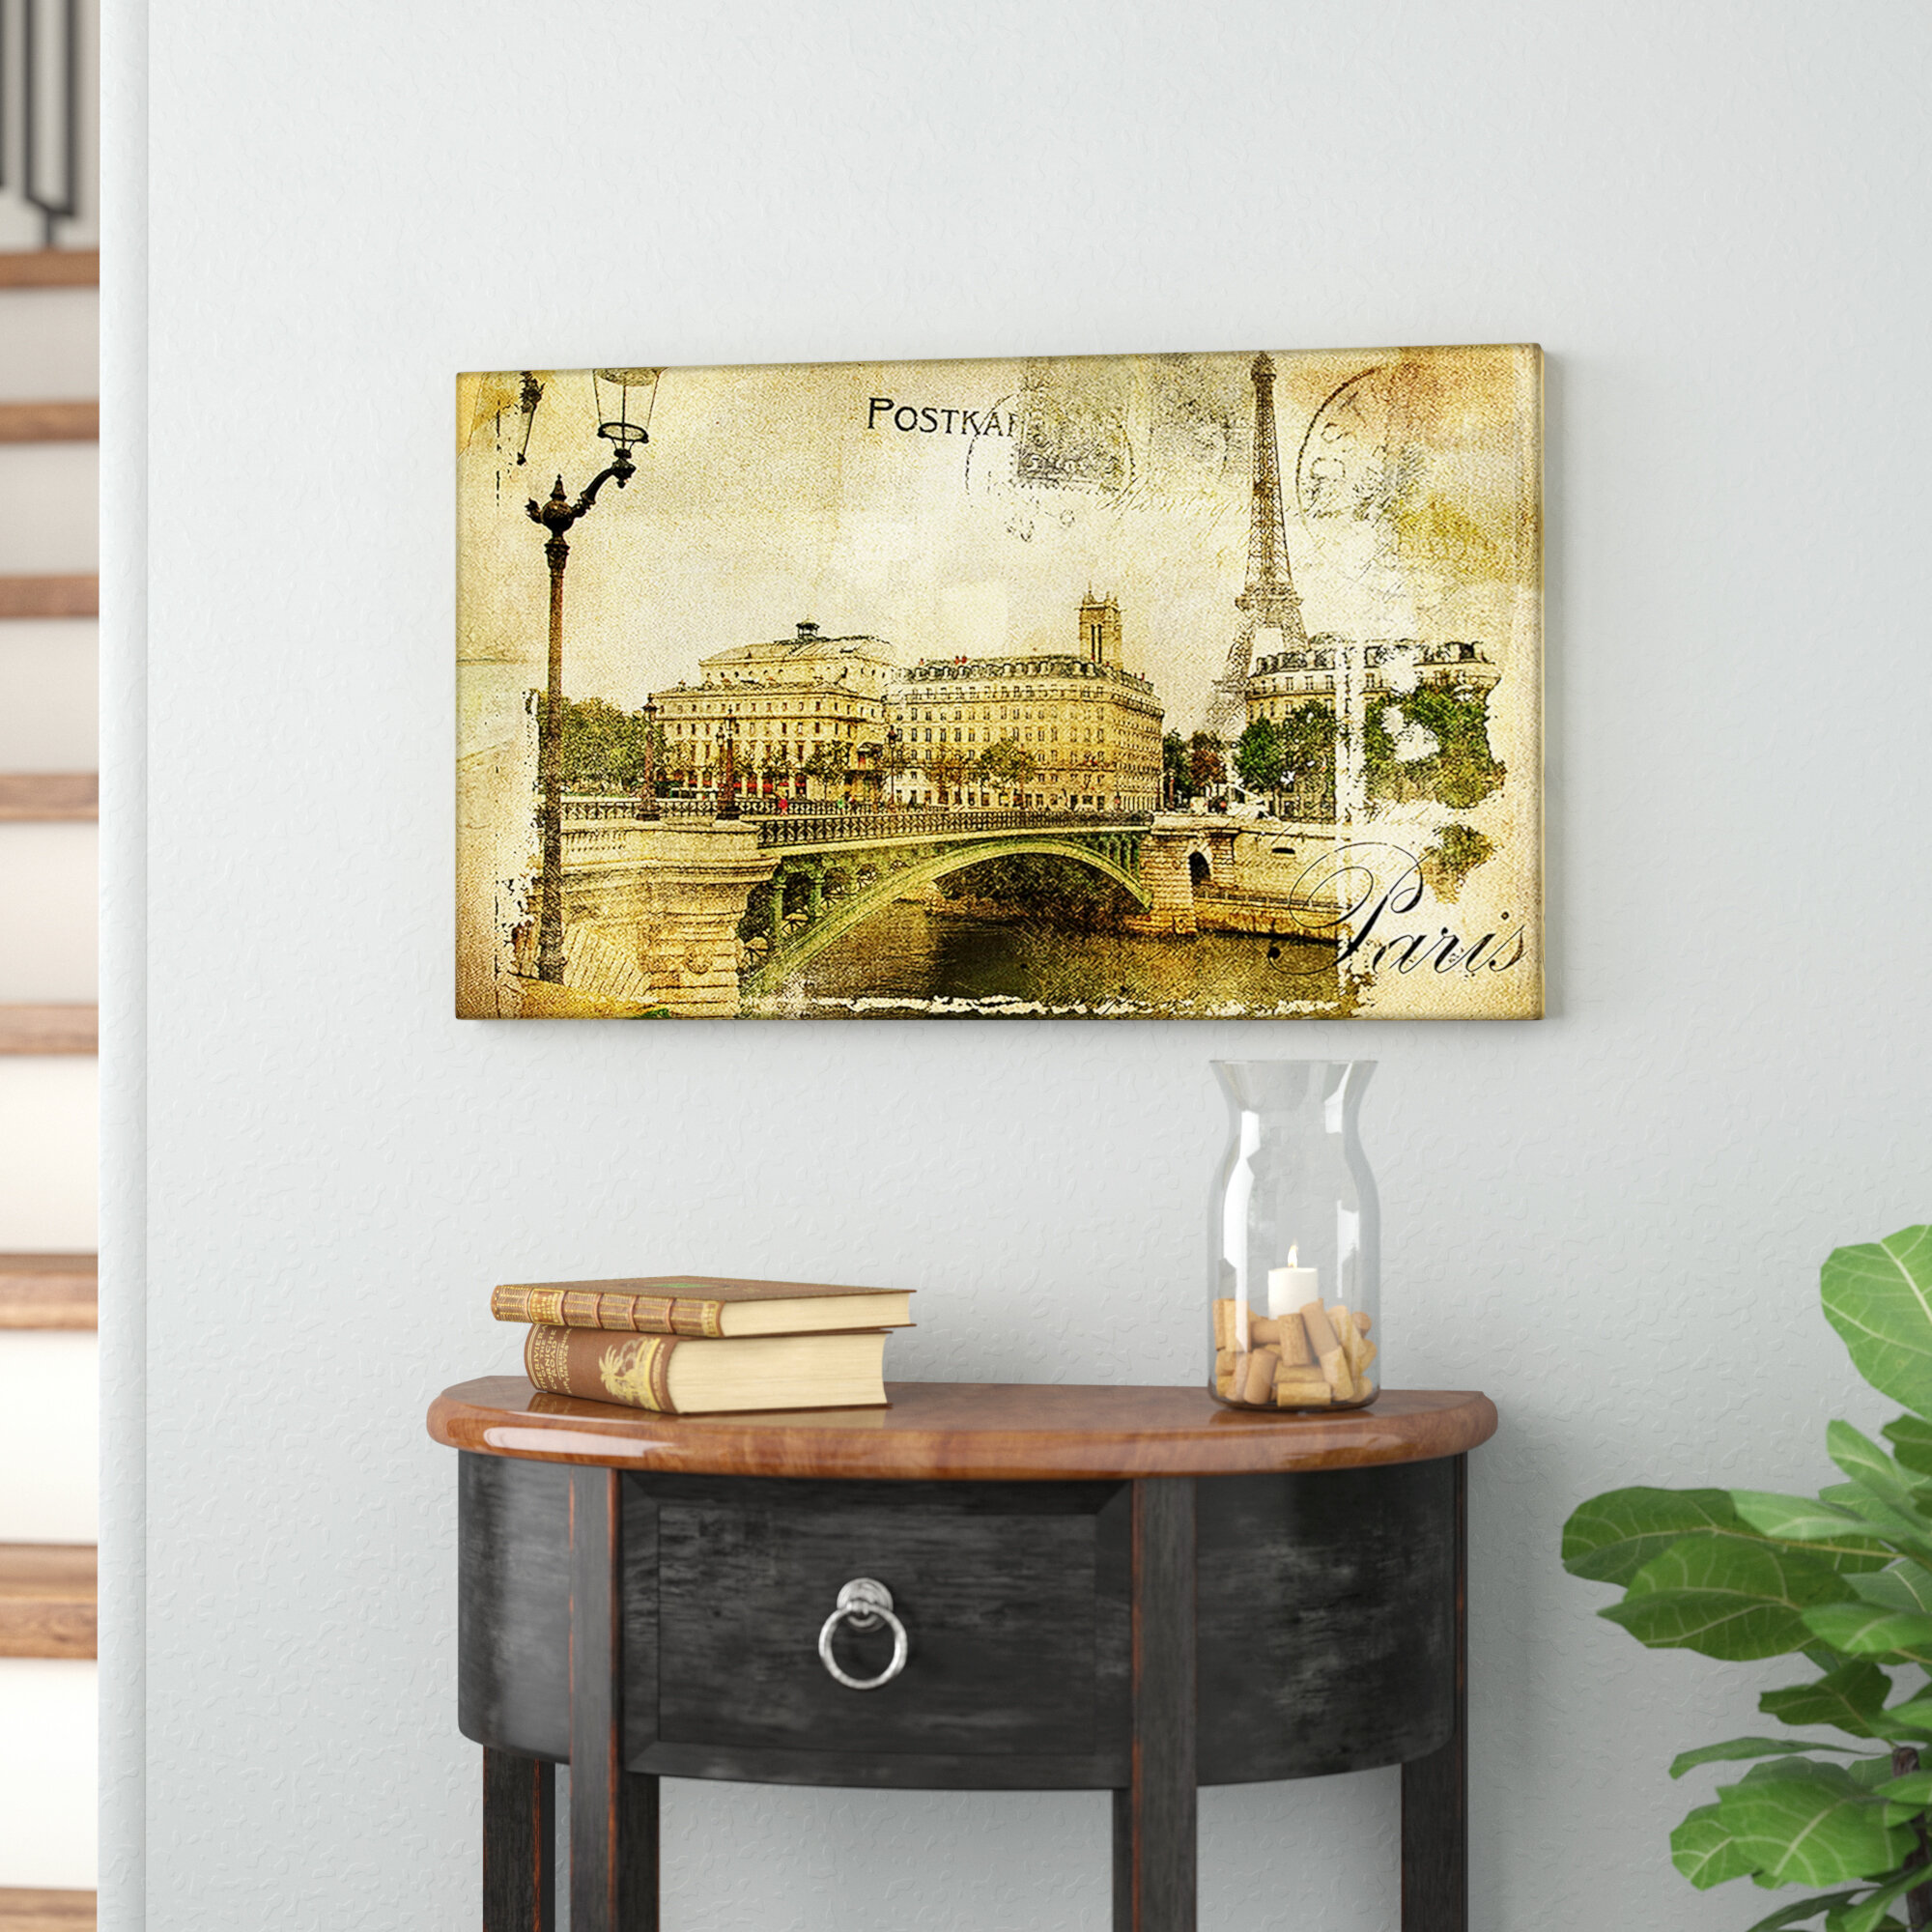 East Urban Home \'Vintage Paris\' Graphic Art Print on Canvas   Wayfair